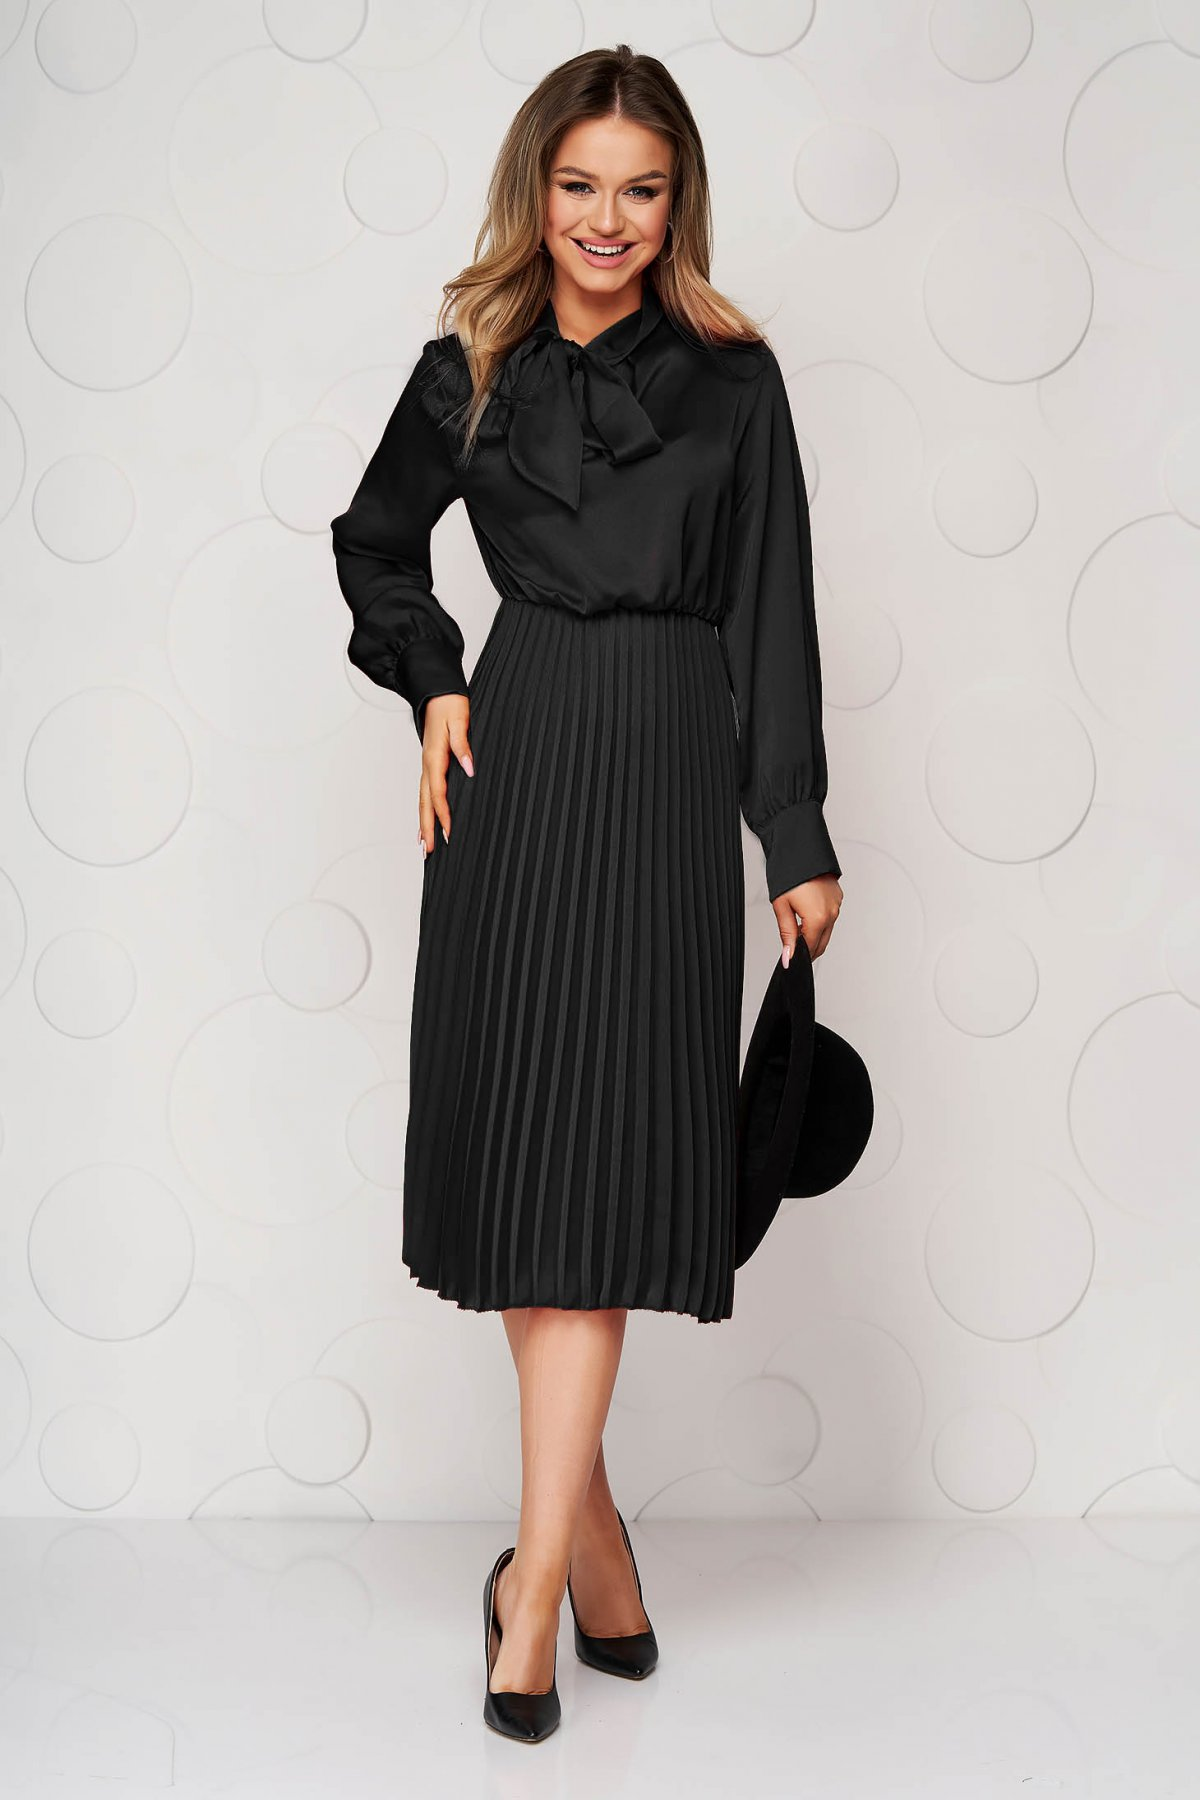 Rochie SunShine neagra office plisata din satin in clos cu elastic in talie